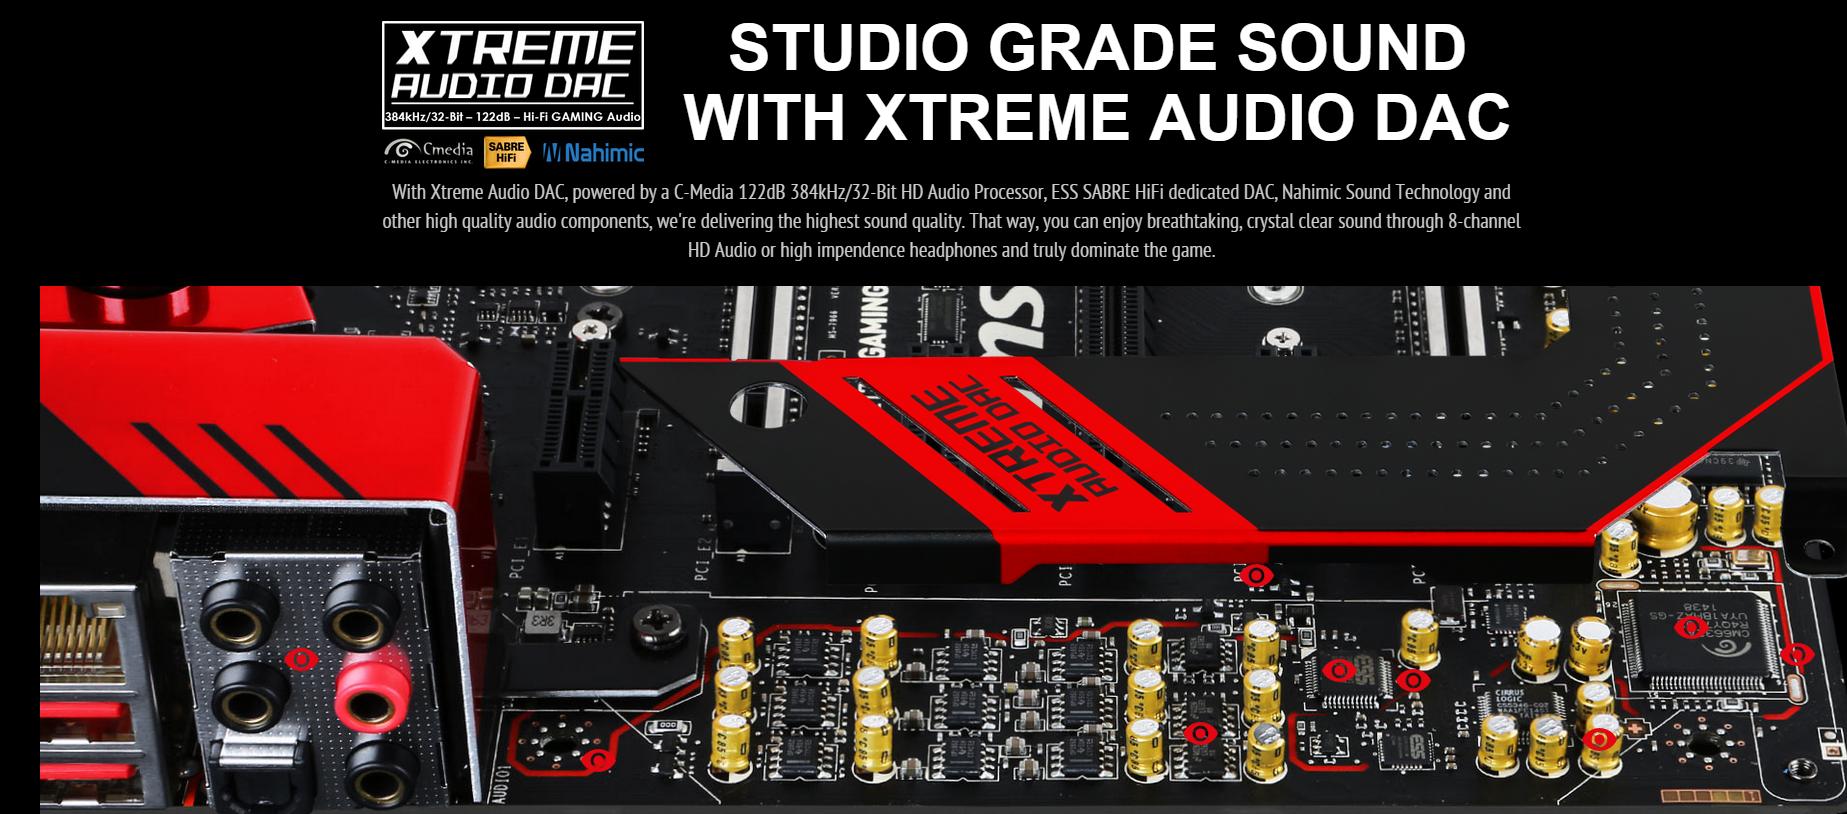 Xtreme Audio DAC